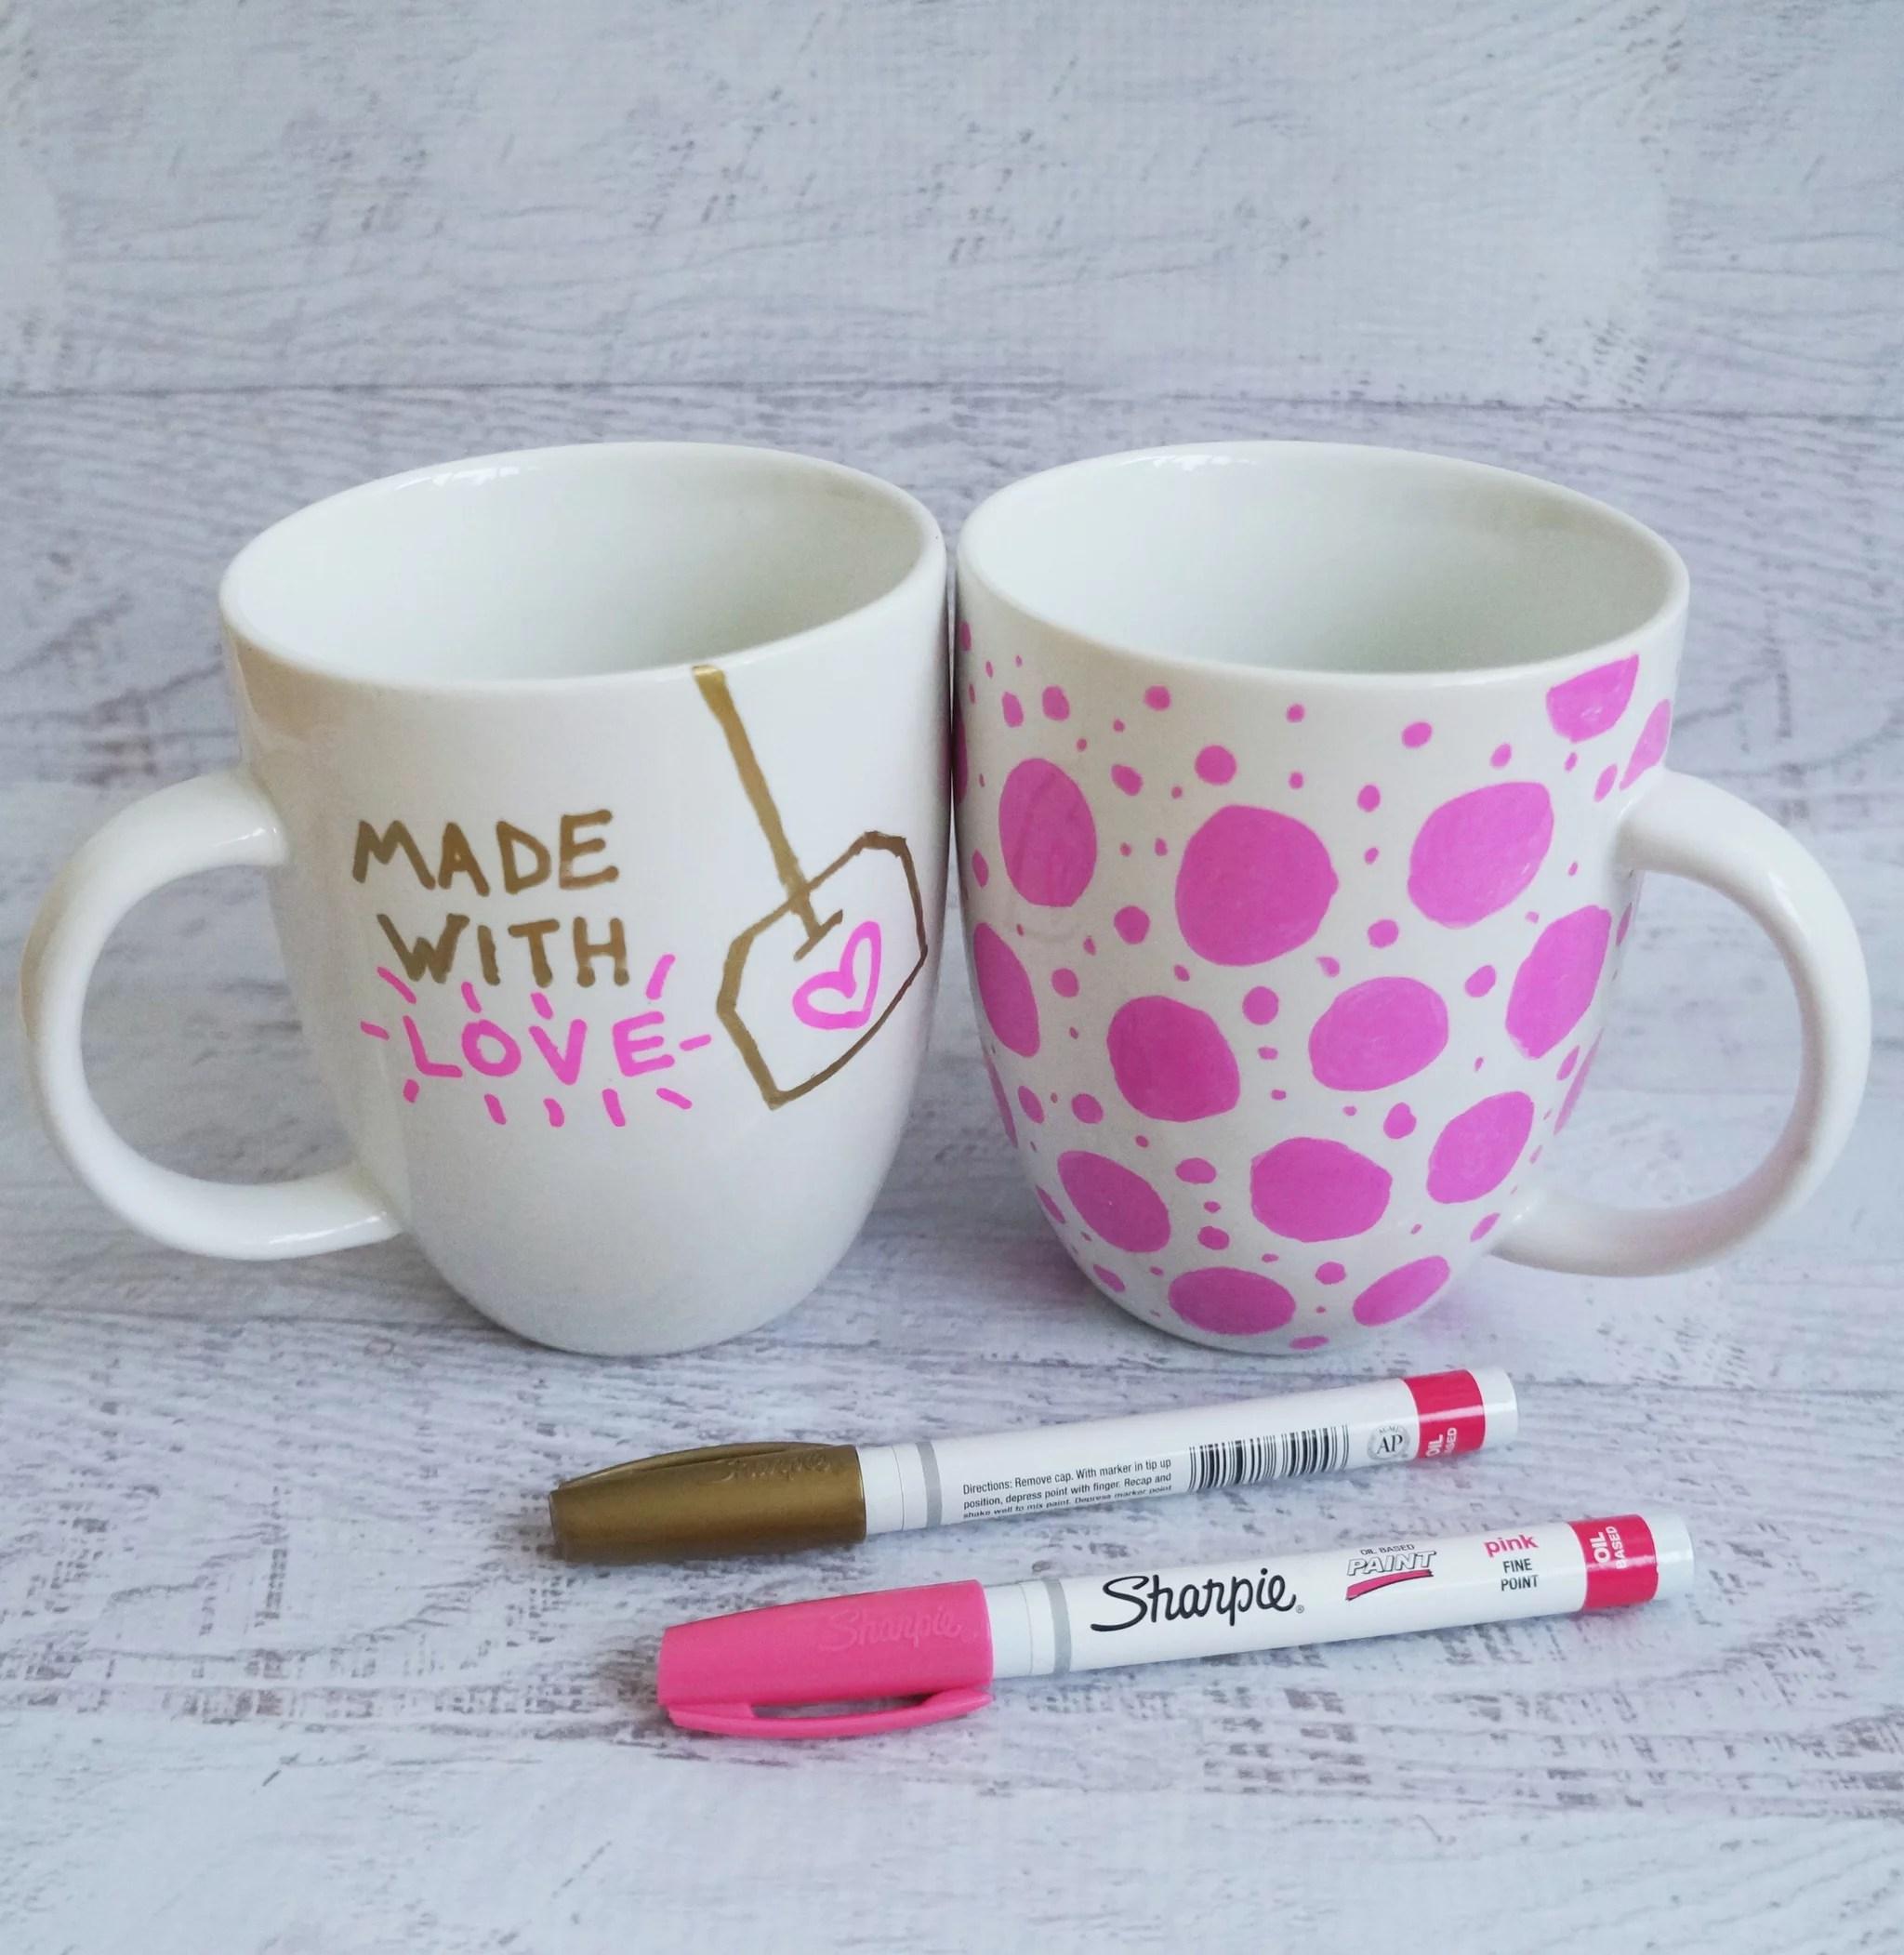 Sharpie Mug DIY Project POPSUGAR Smart Living